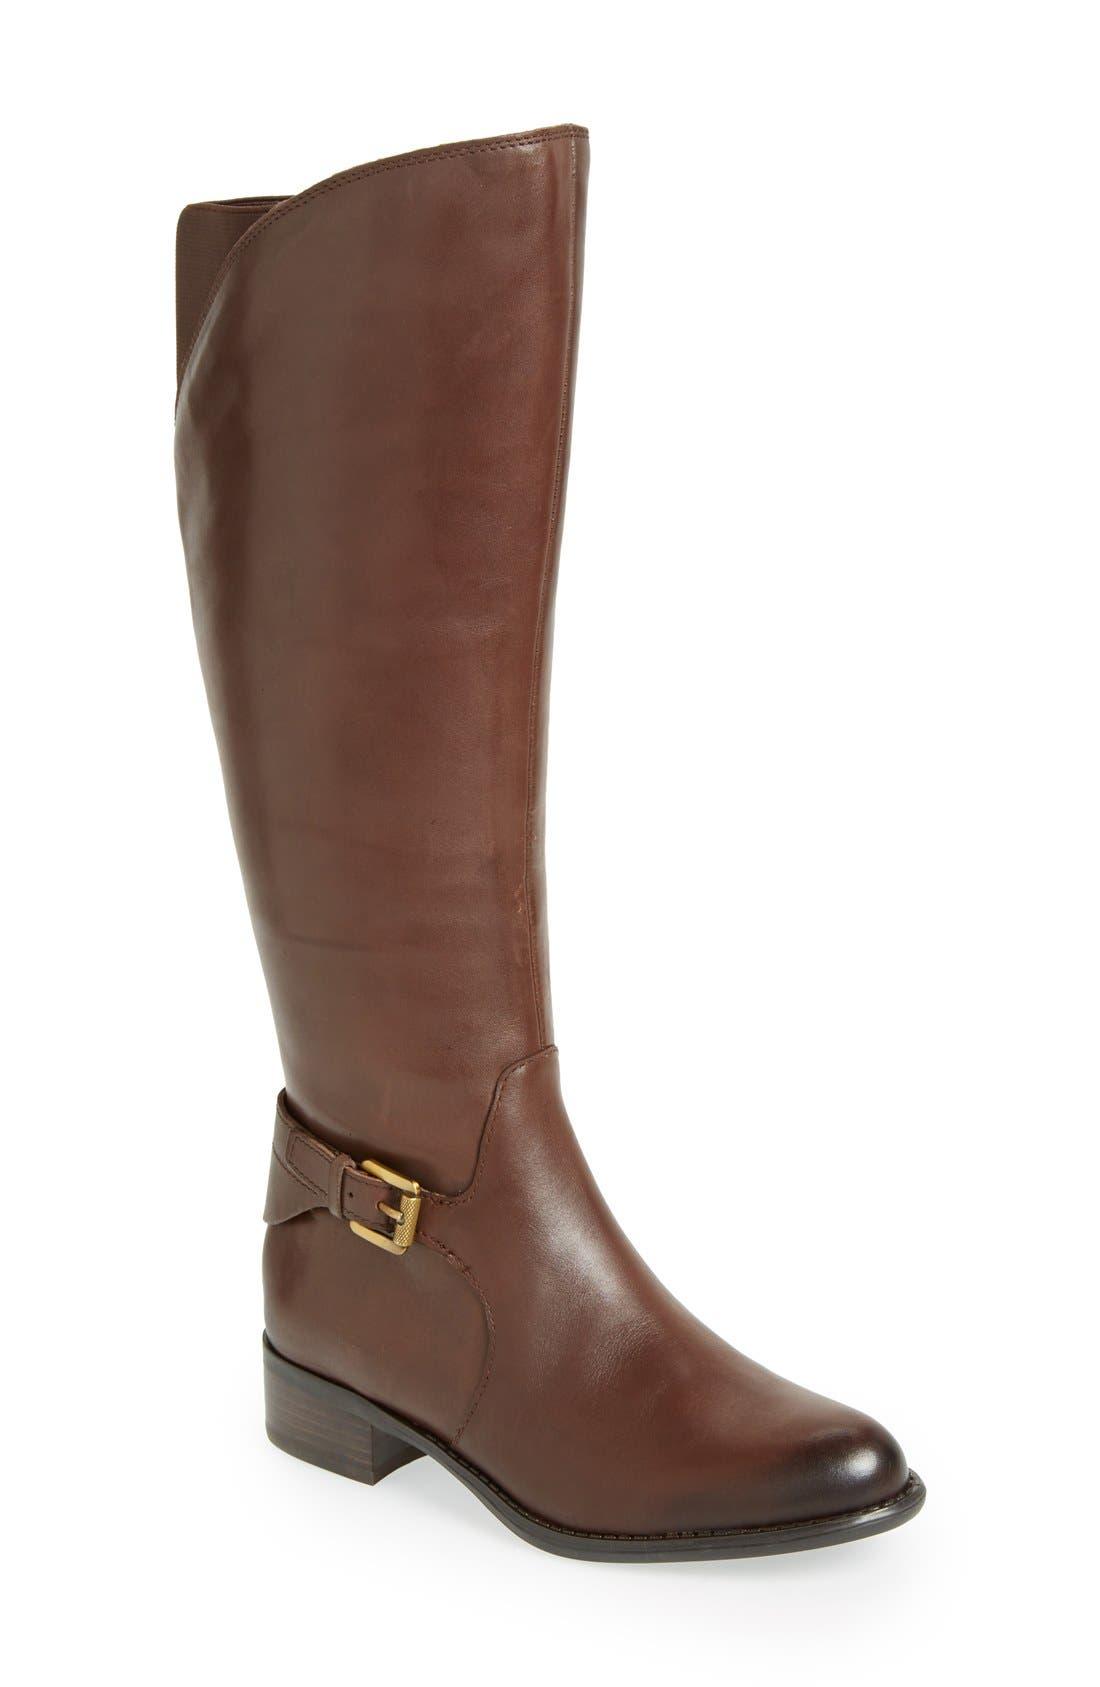 Alternate Image 1 Selected - Franco Sarto 'Craze' Knee High Leather Boot (Women)